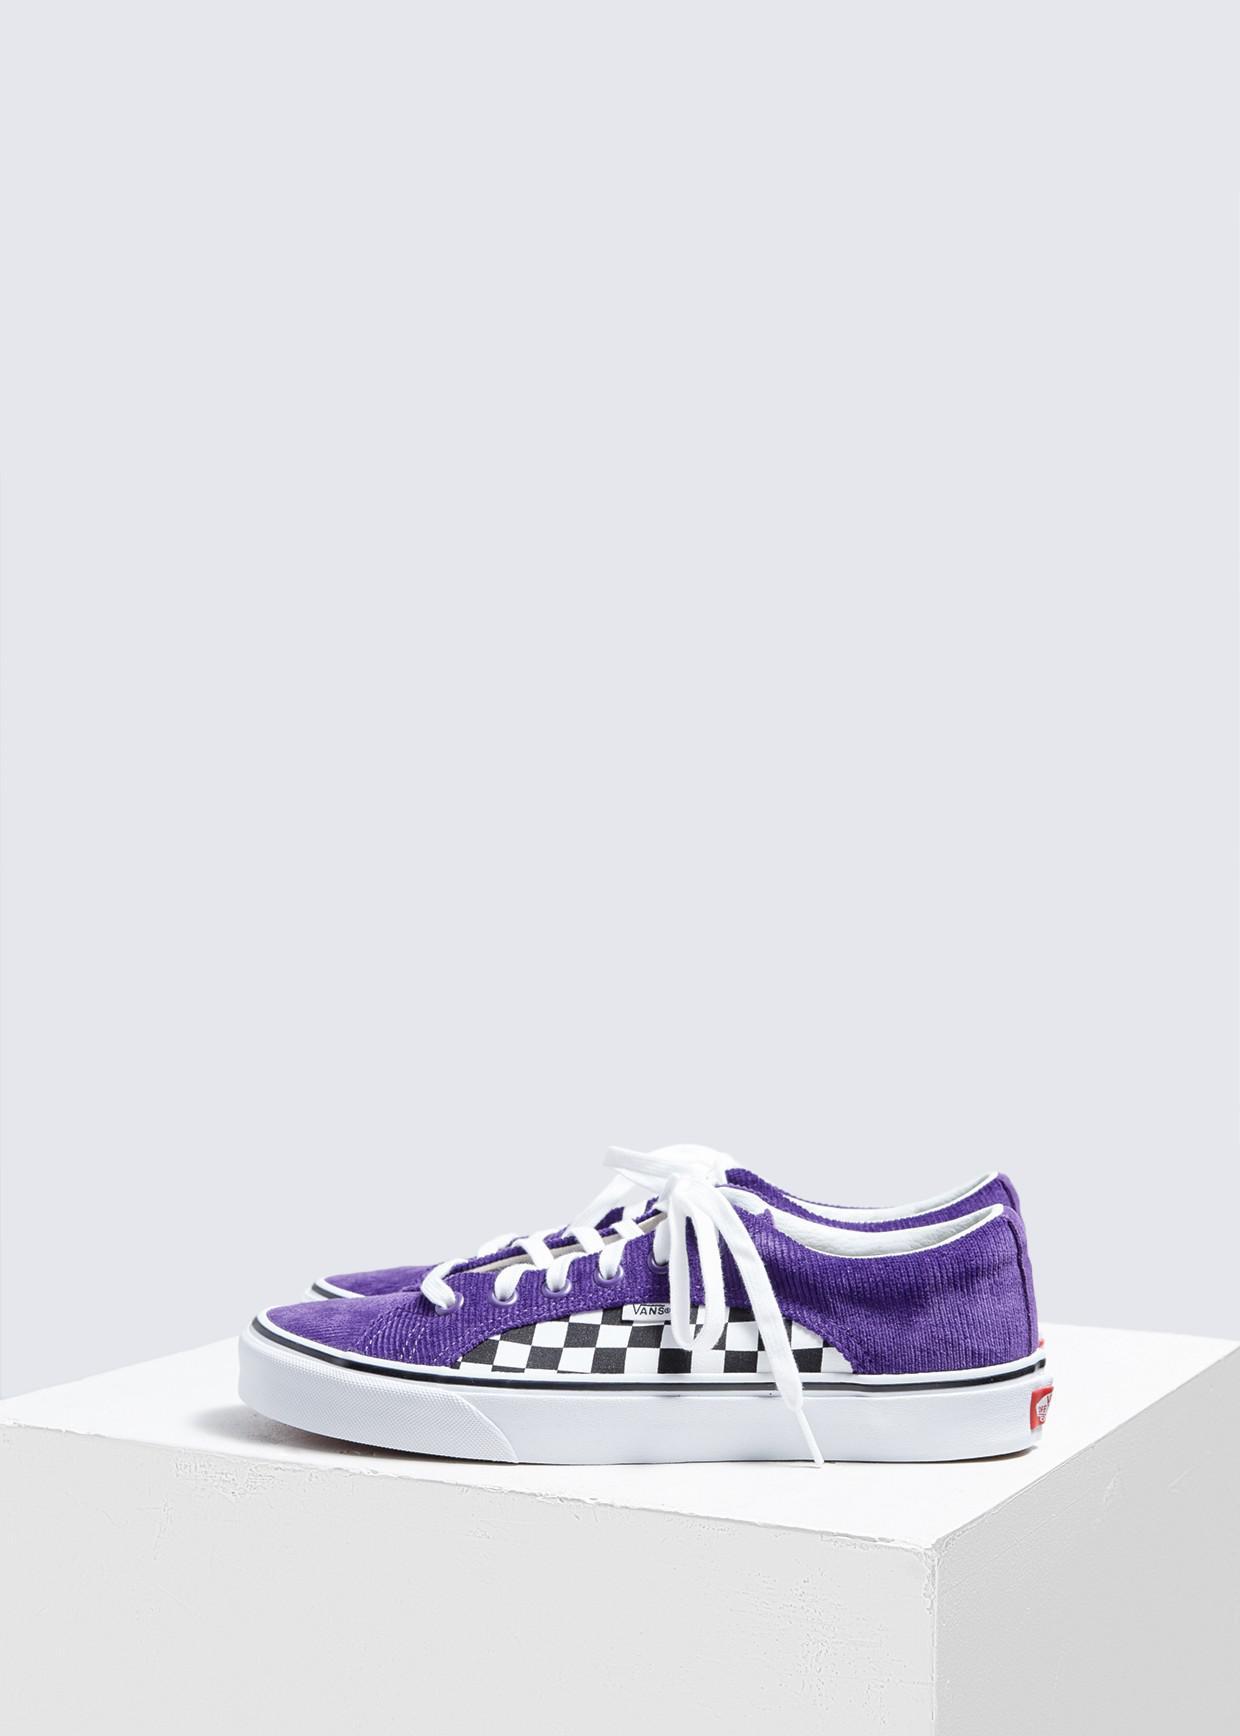 a14e369f9d5907 Lyst - Vans Checker   Cord Lampin Sneaker in White for Men